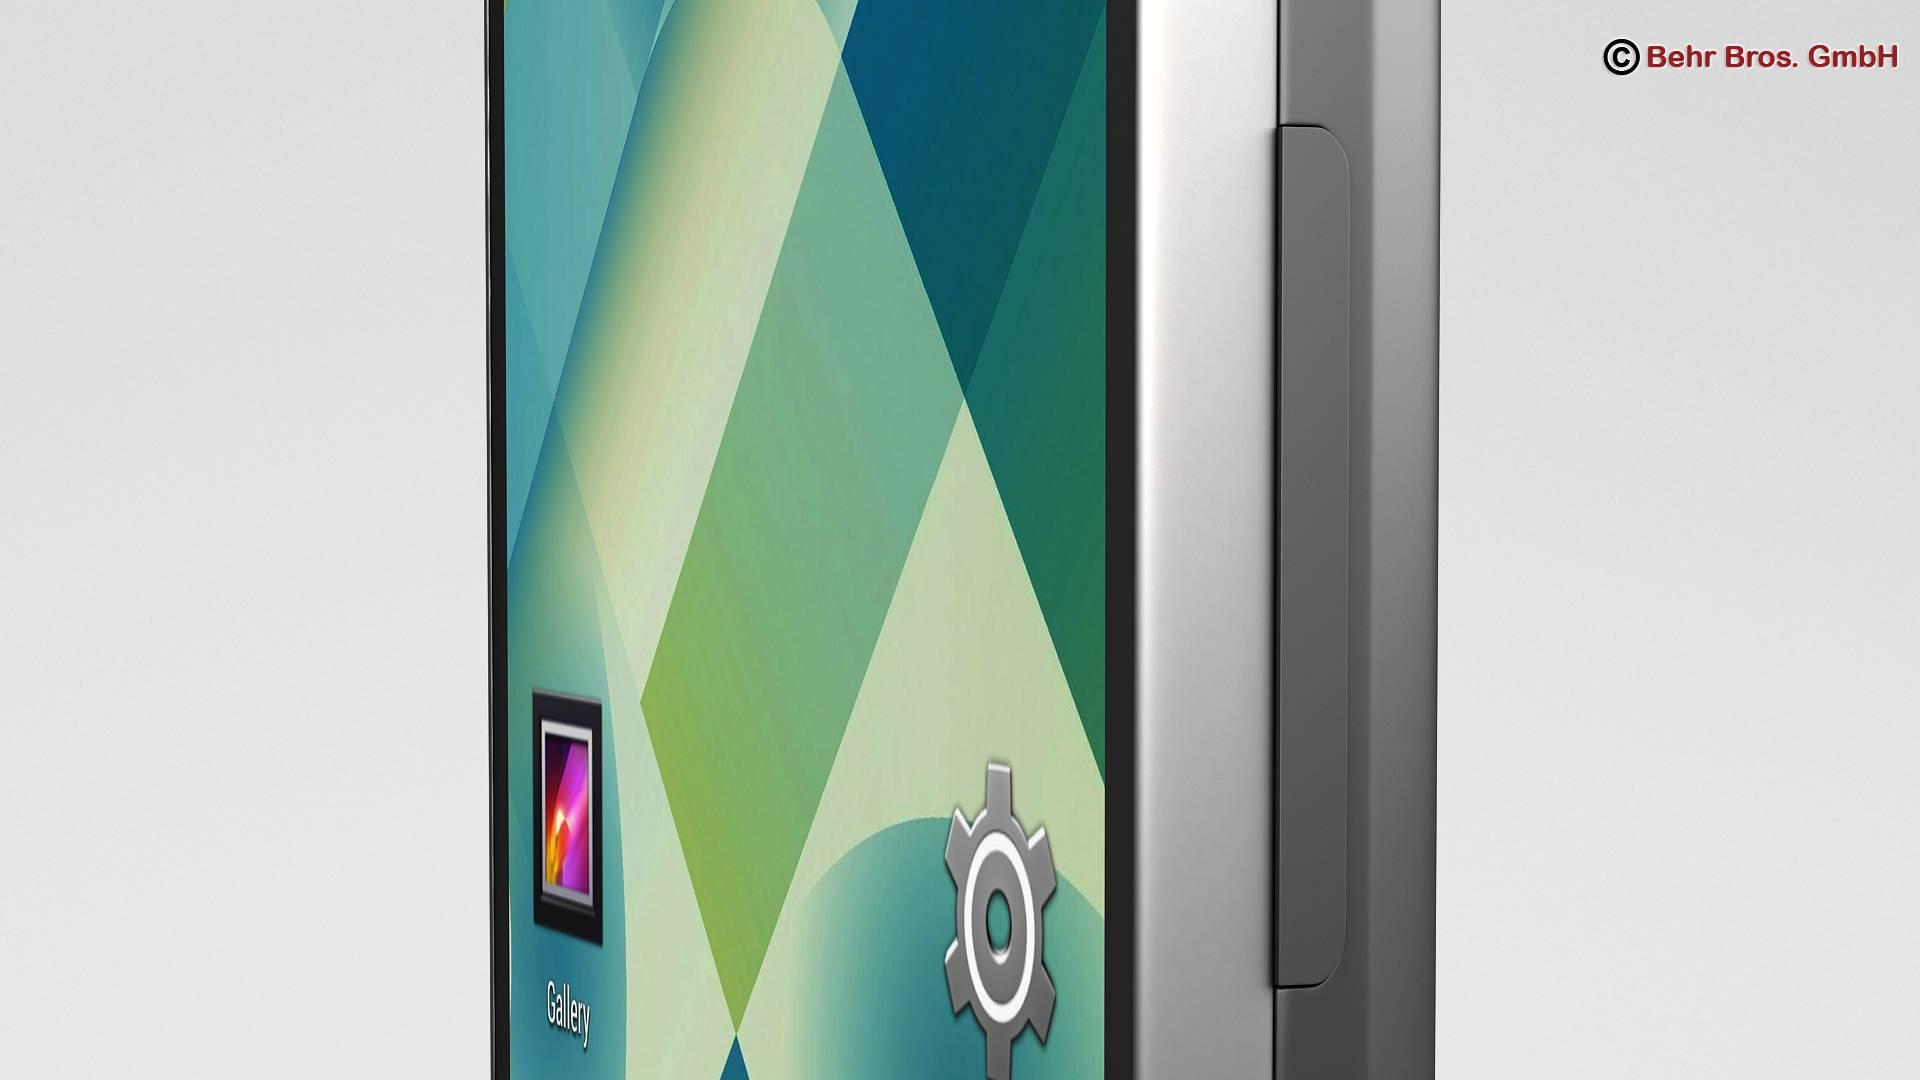 generic smartphone 4 inch 3d model 3ds max fbx c4d lwo ma mb obj 161626